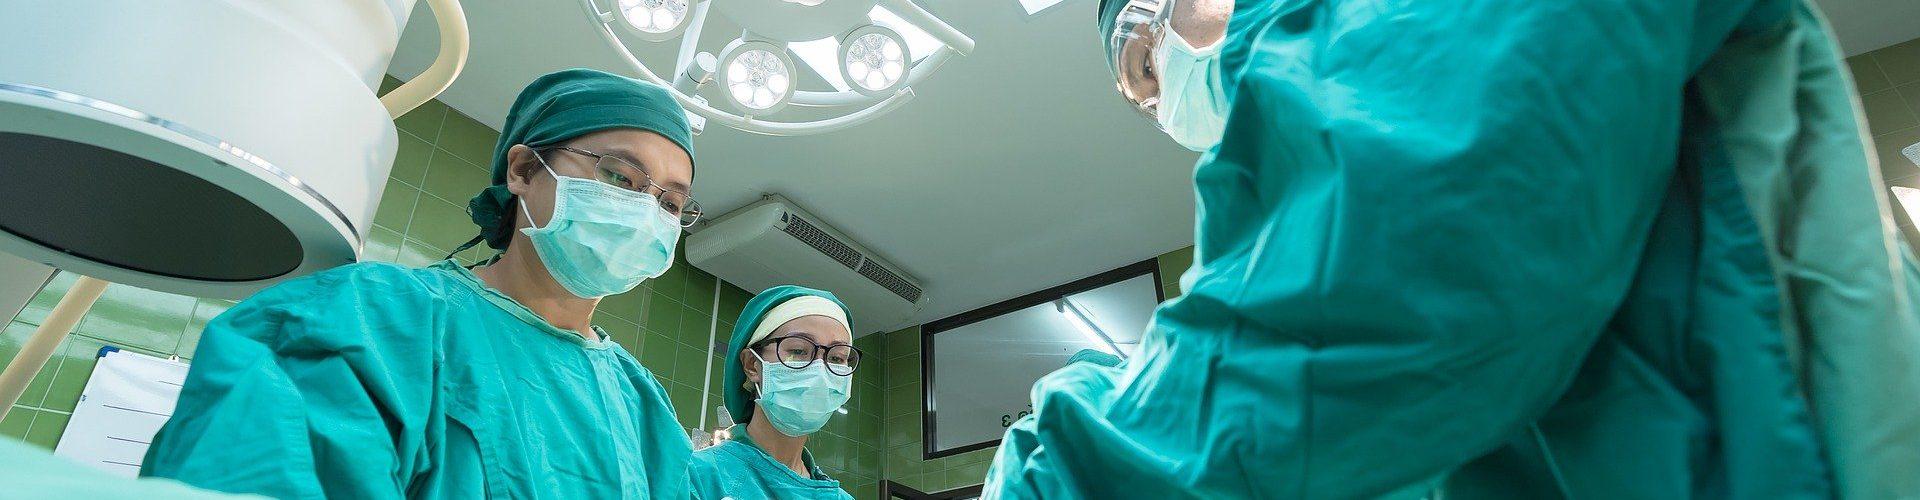 surgery-1807541_1920